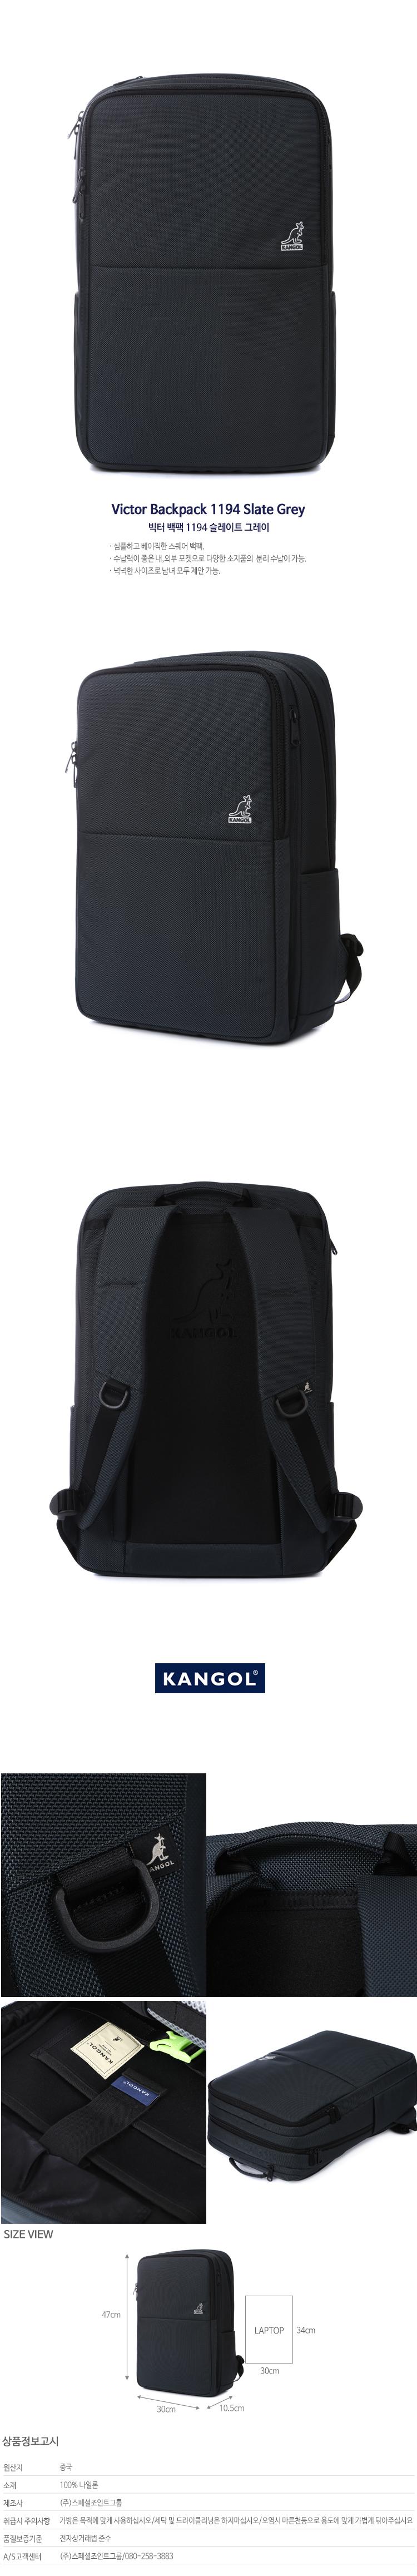 Victor Backpack 1194 SLATE GREY